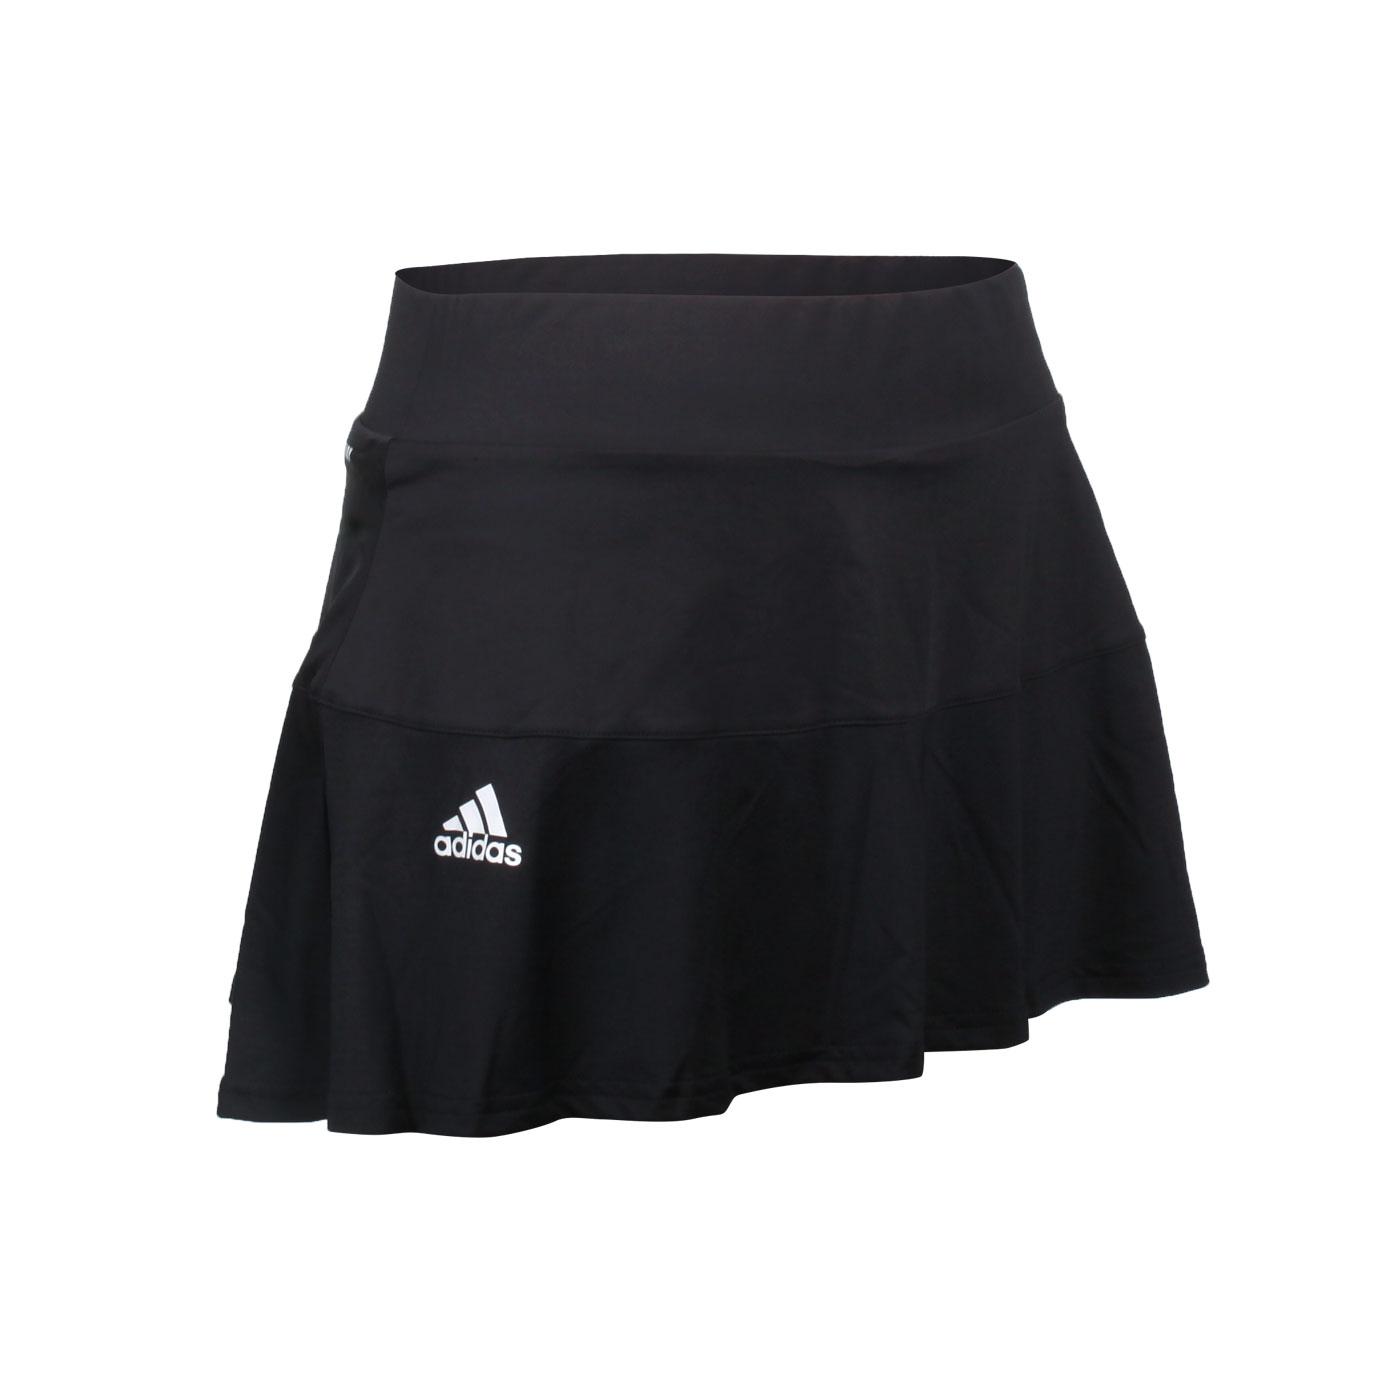 ADIDAS 女款運動短裙 GL6203 - 黑白